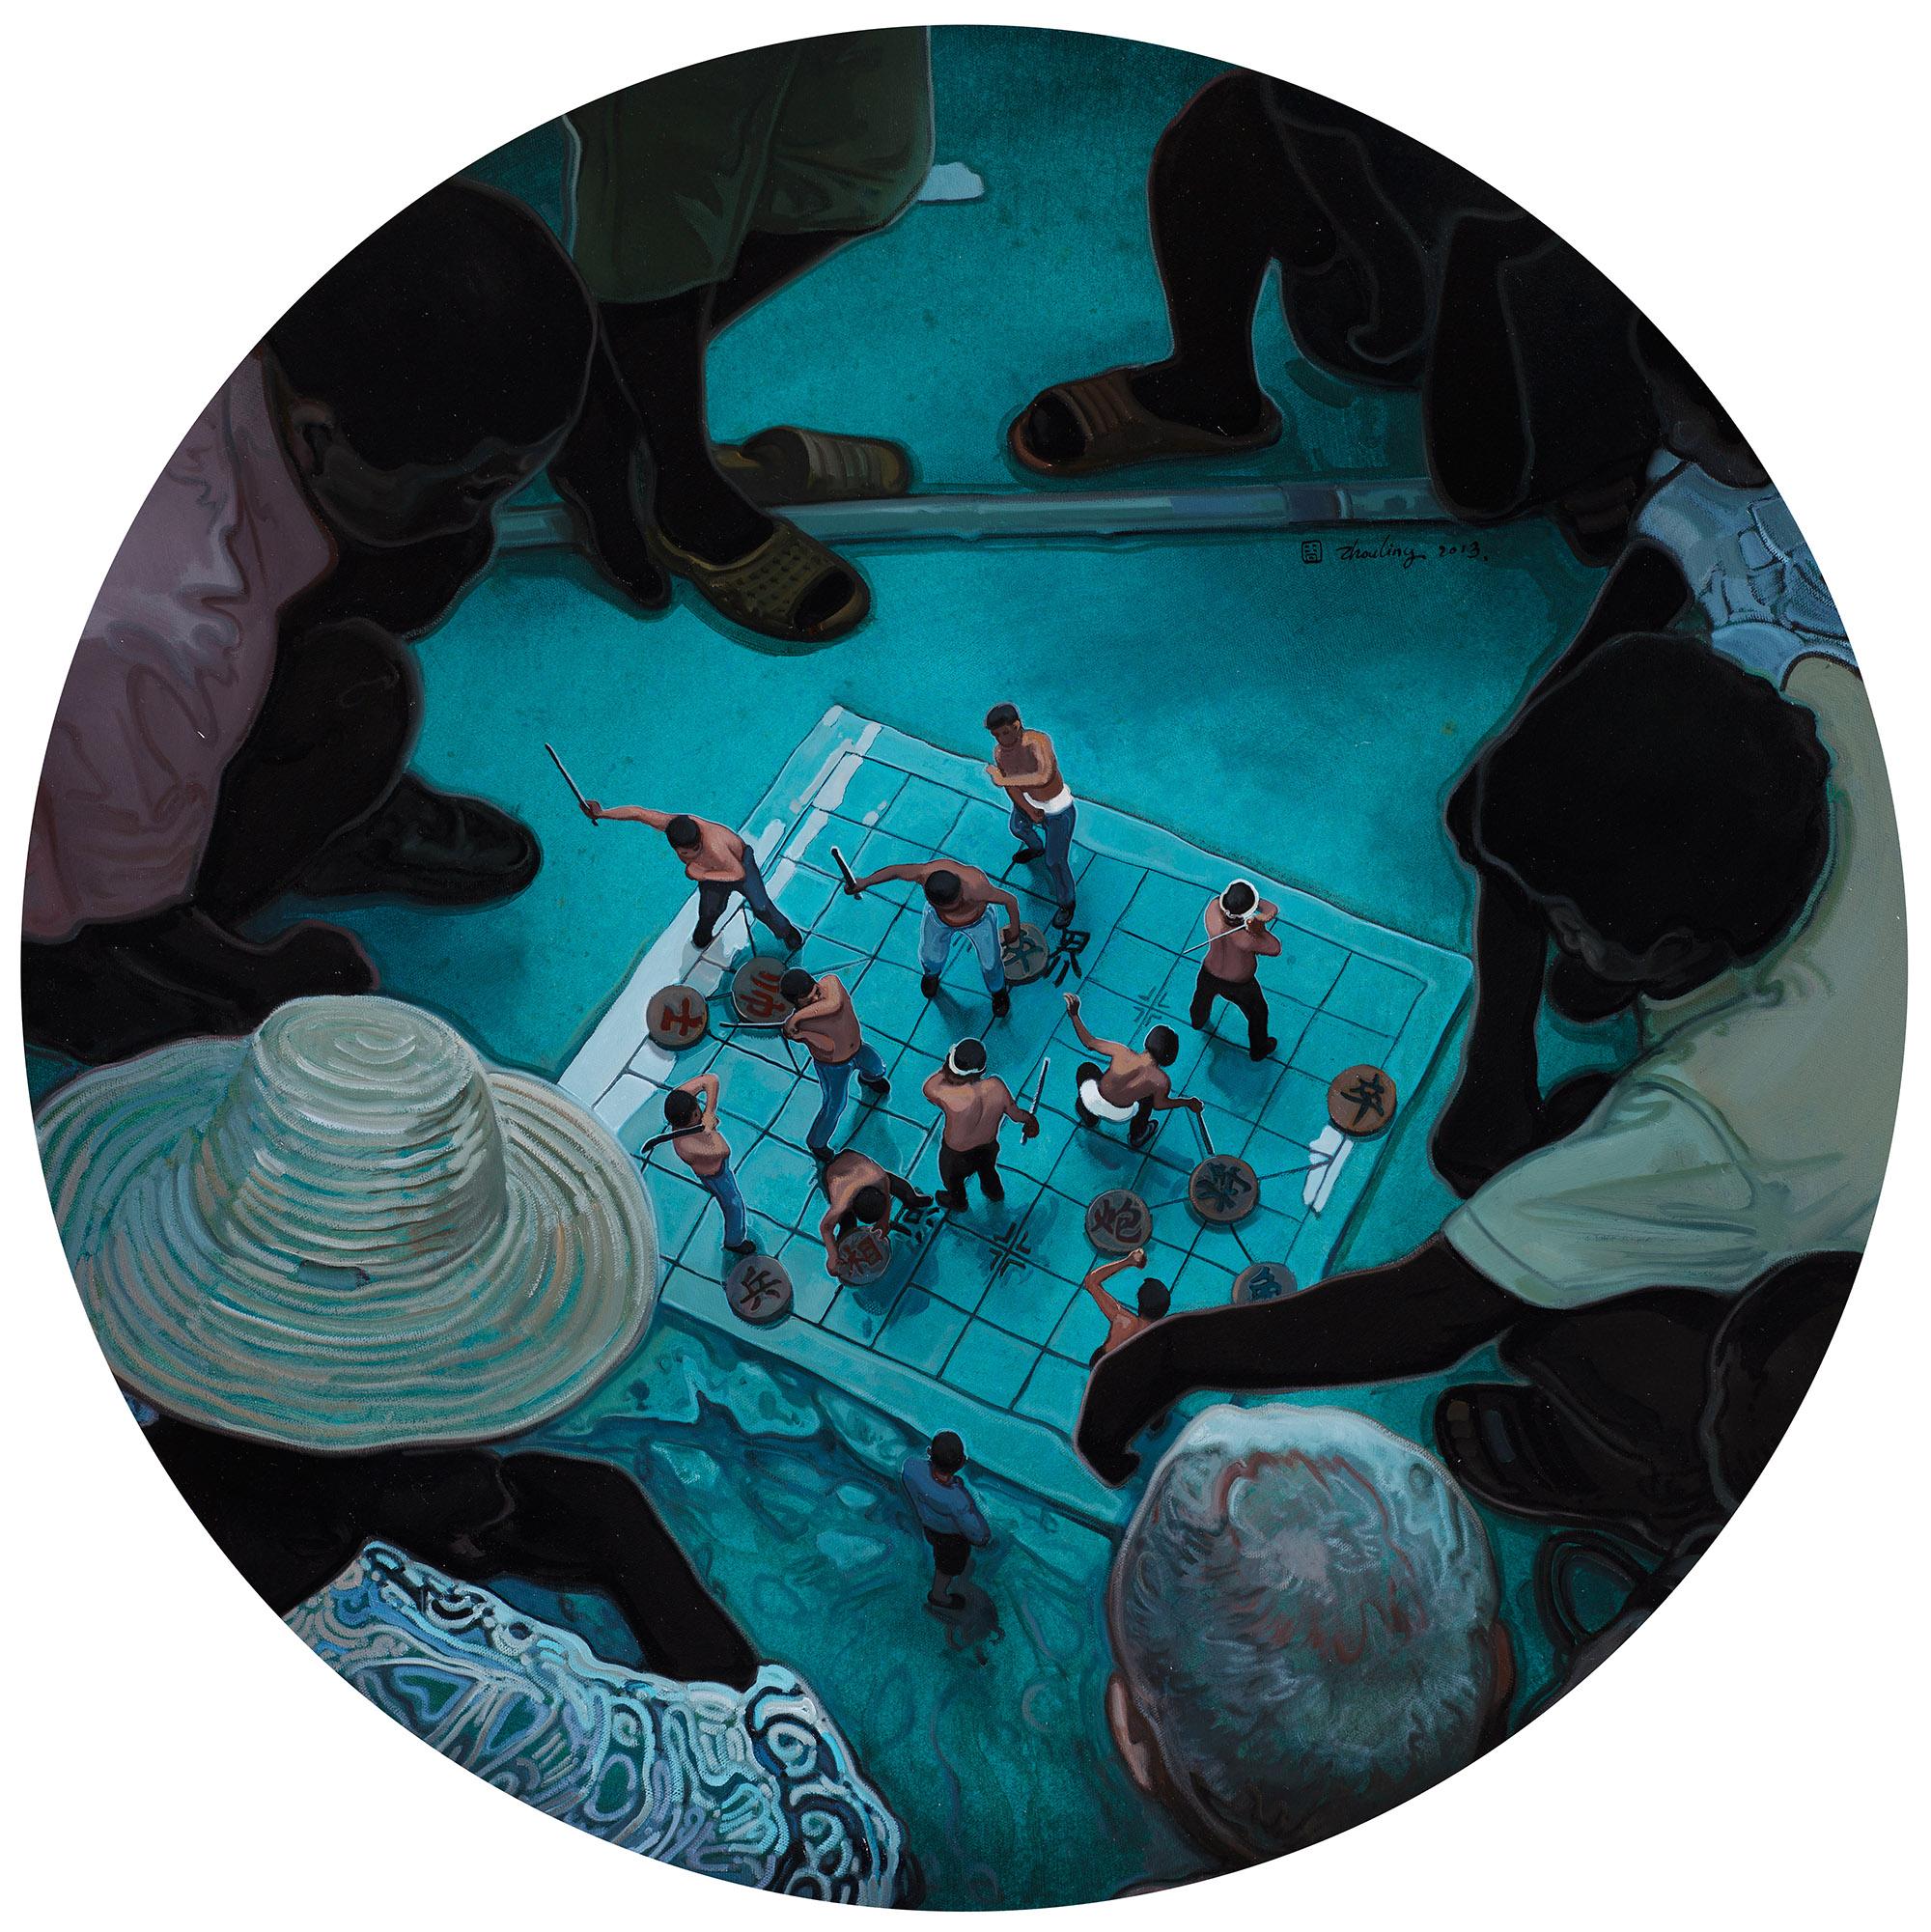 Zhou Jinhua 周金华, Chess Game - Blue 局-青, 2013, Oil on canvas 布面油画, Dia 100 cm